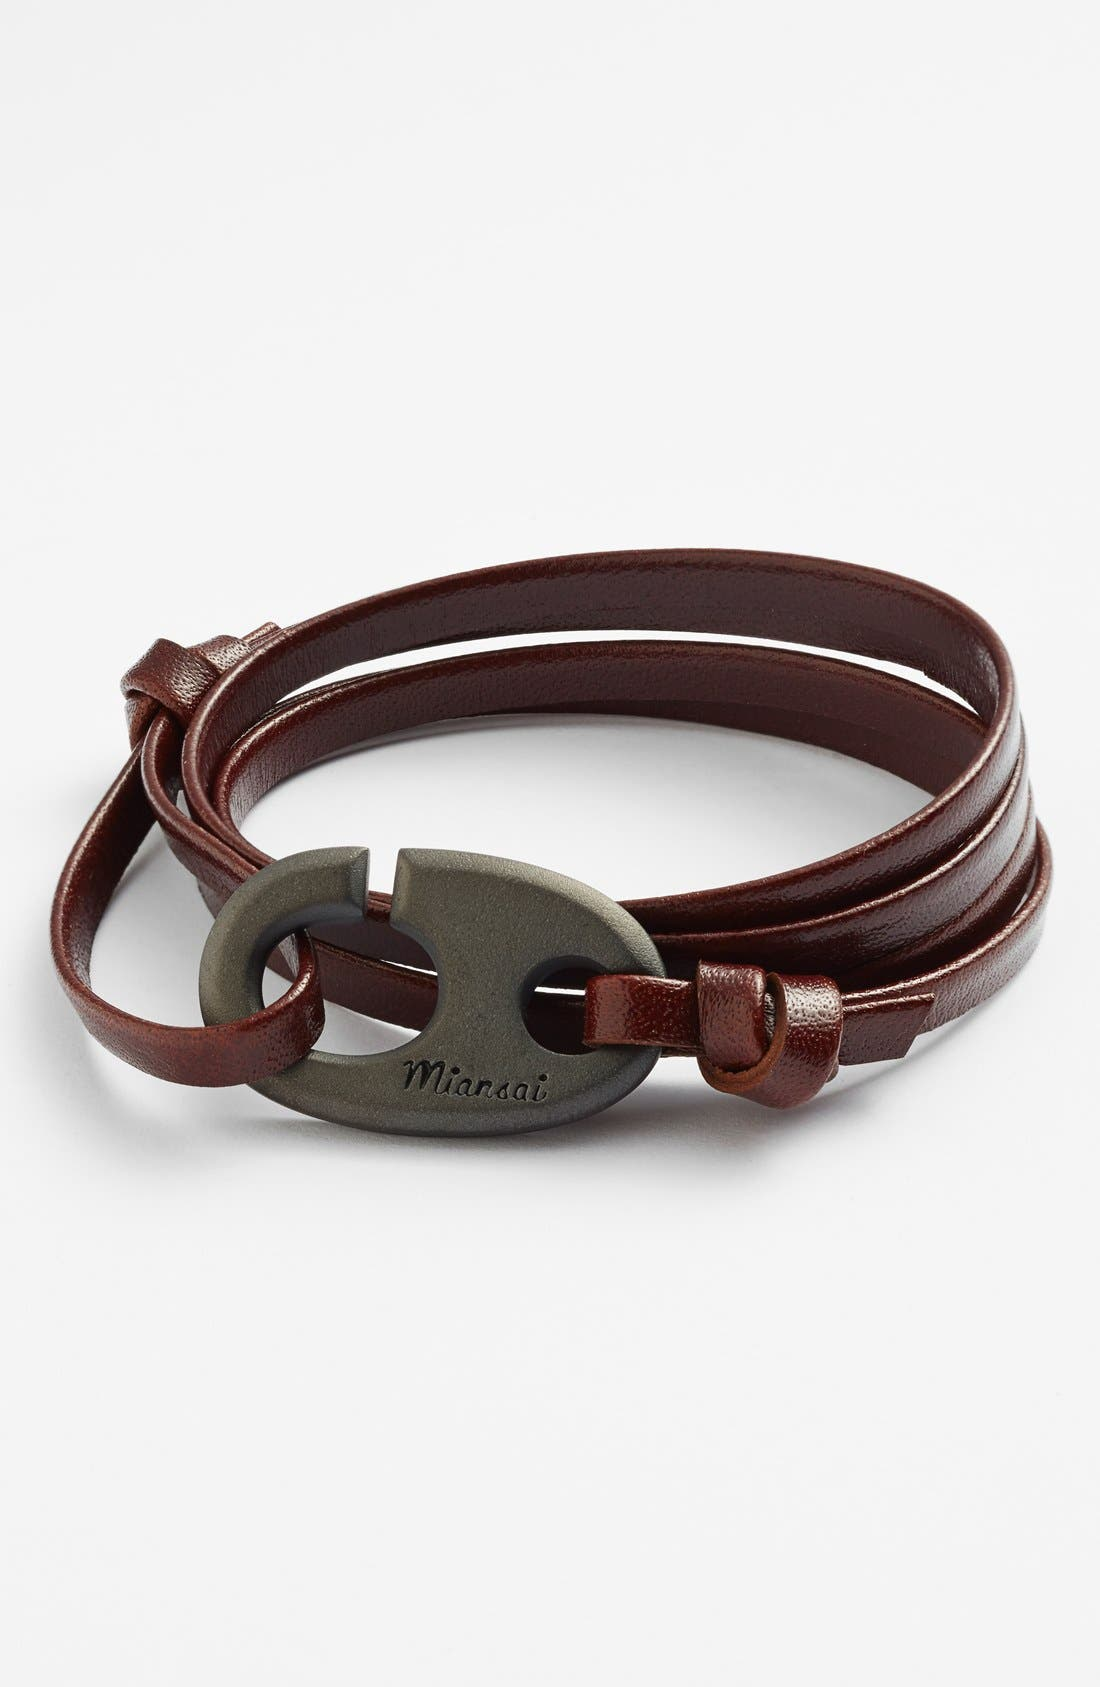 Main Image - Miansai Brummel Hook Leather Bracelet